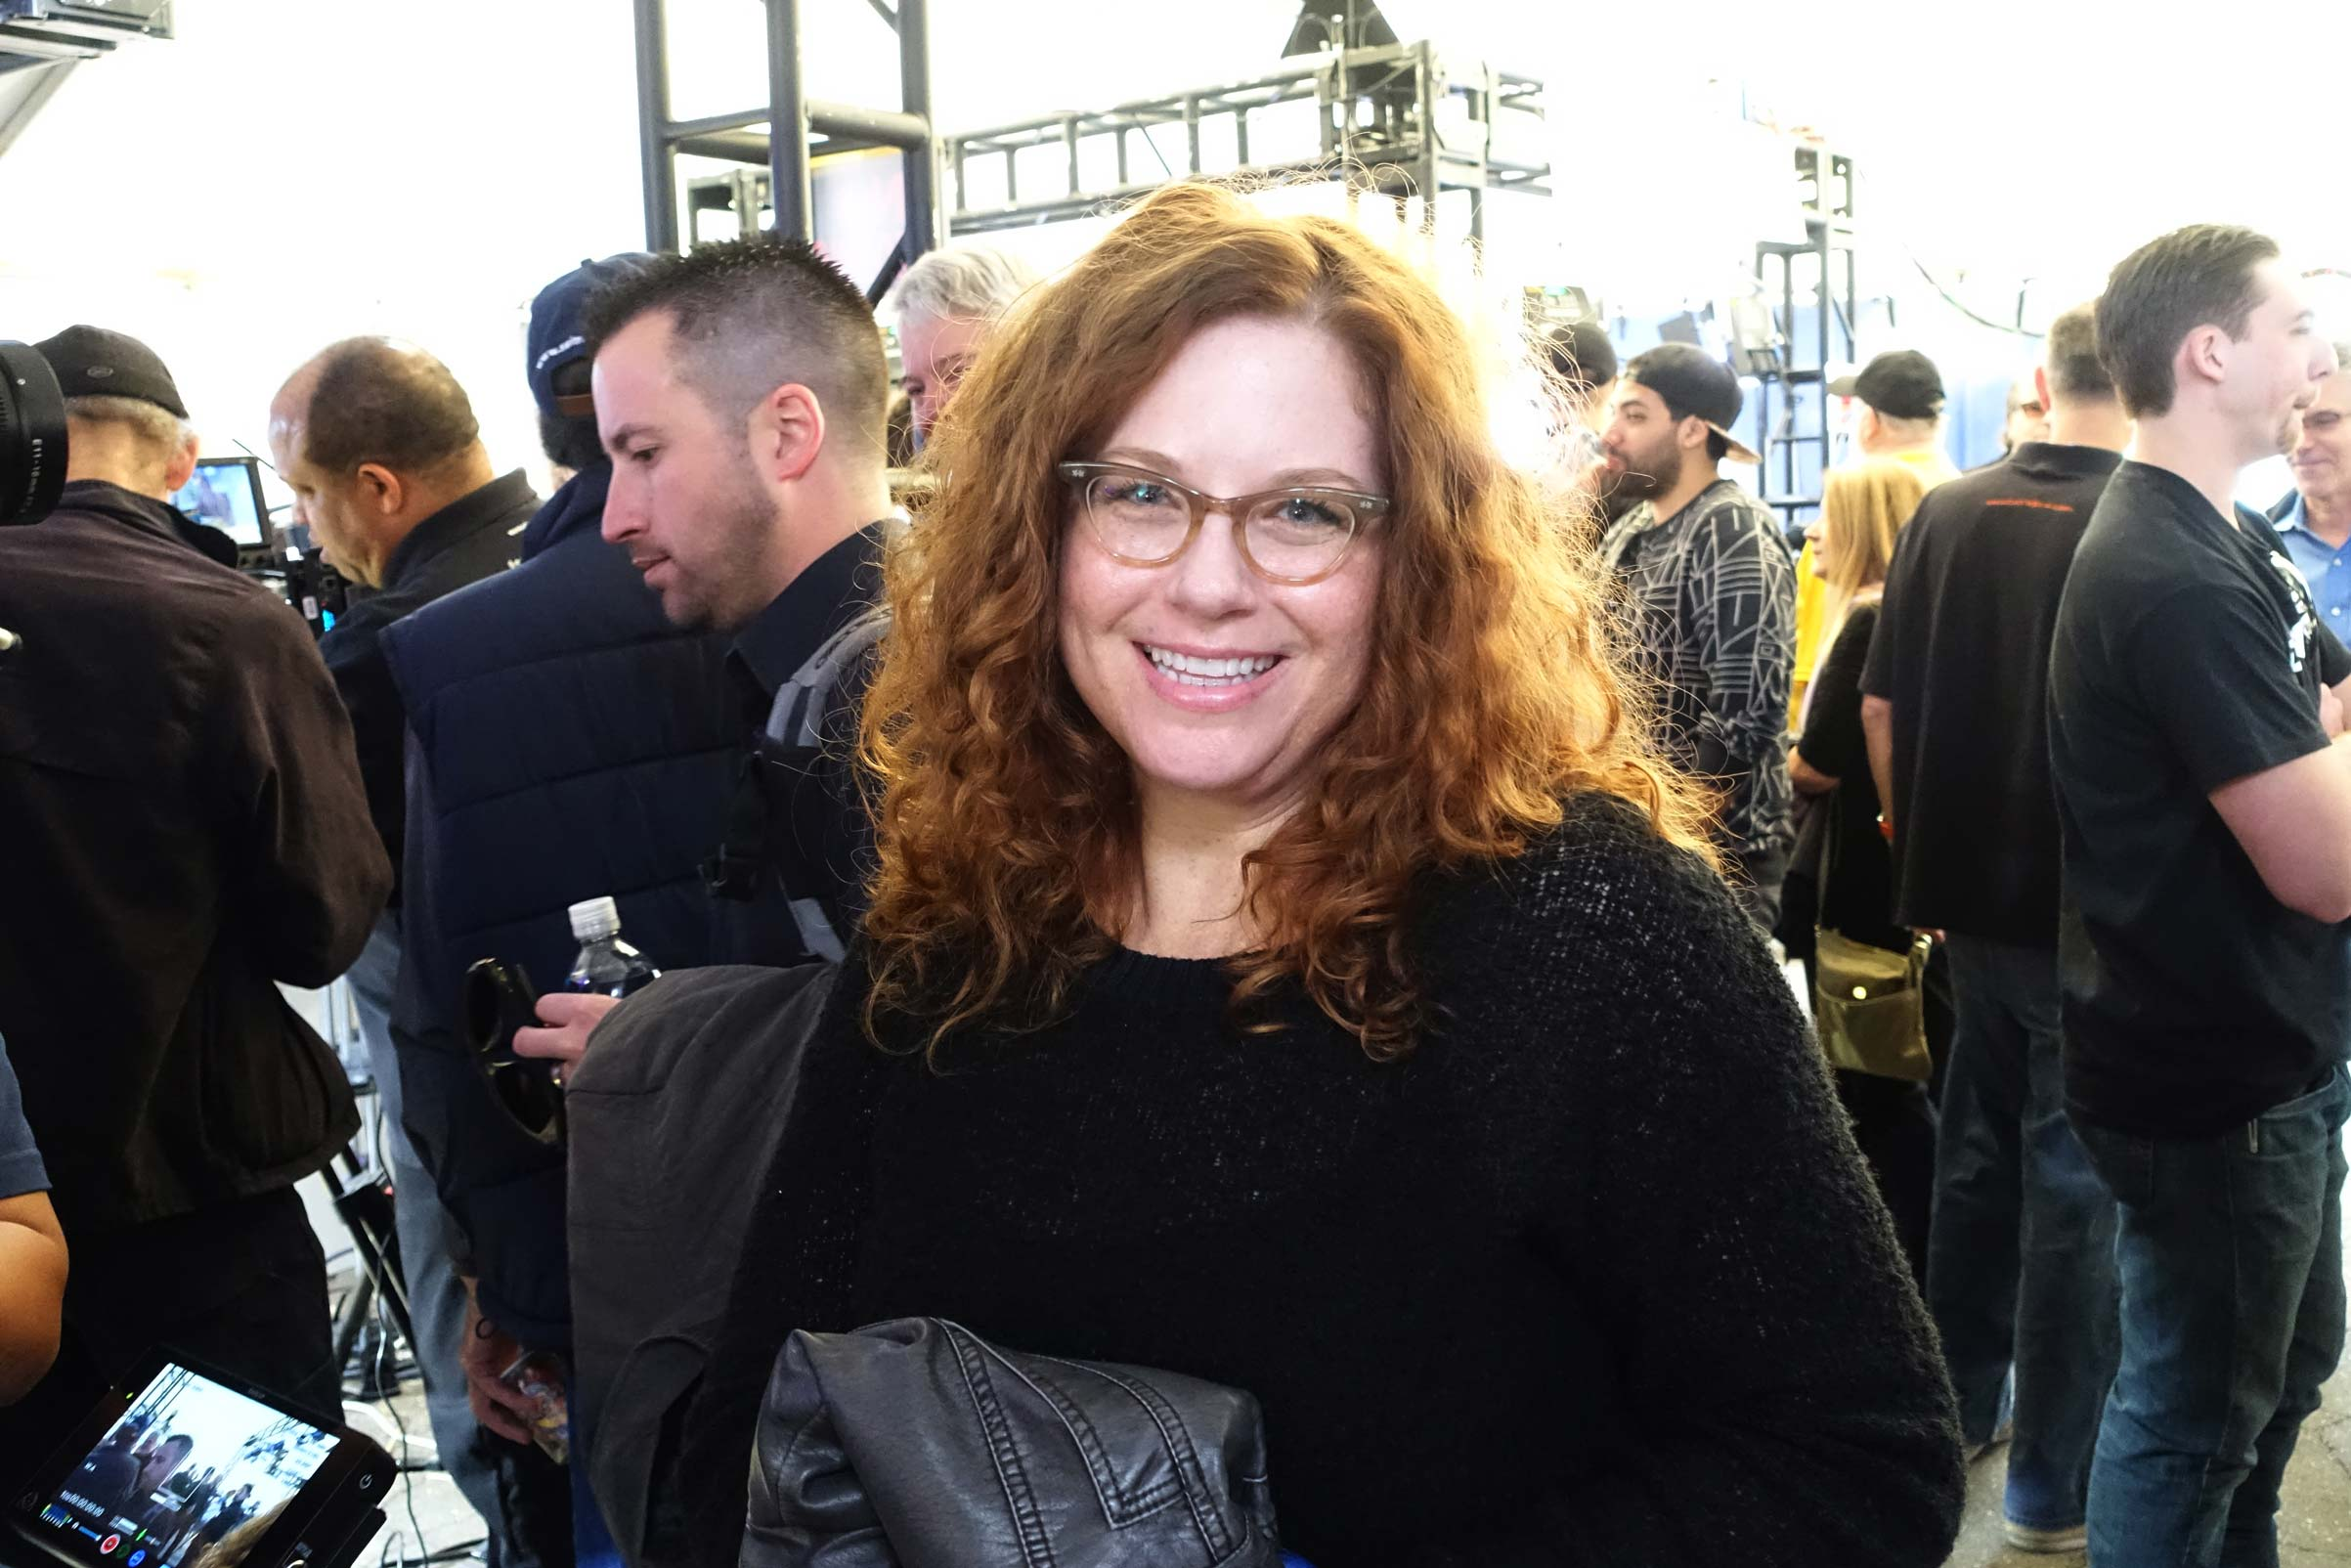 Alanna Berkson from Preston Cinema